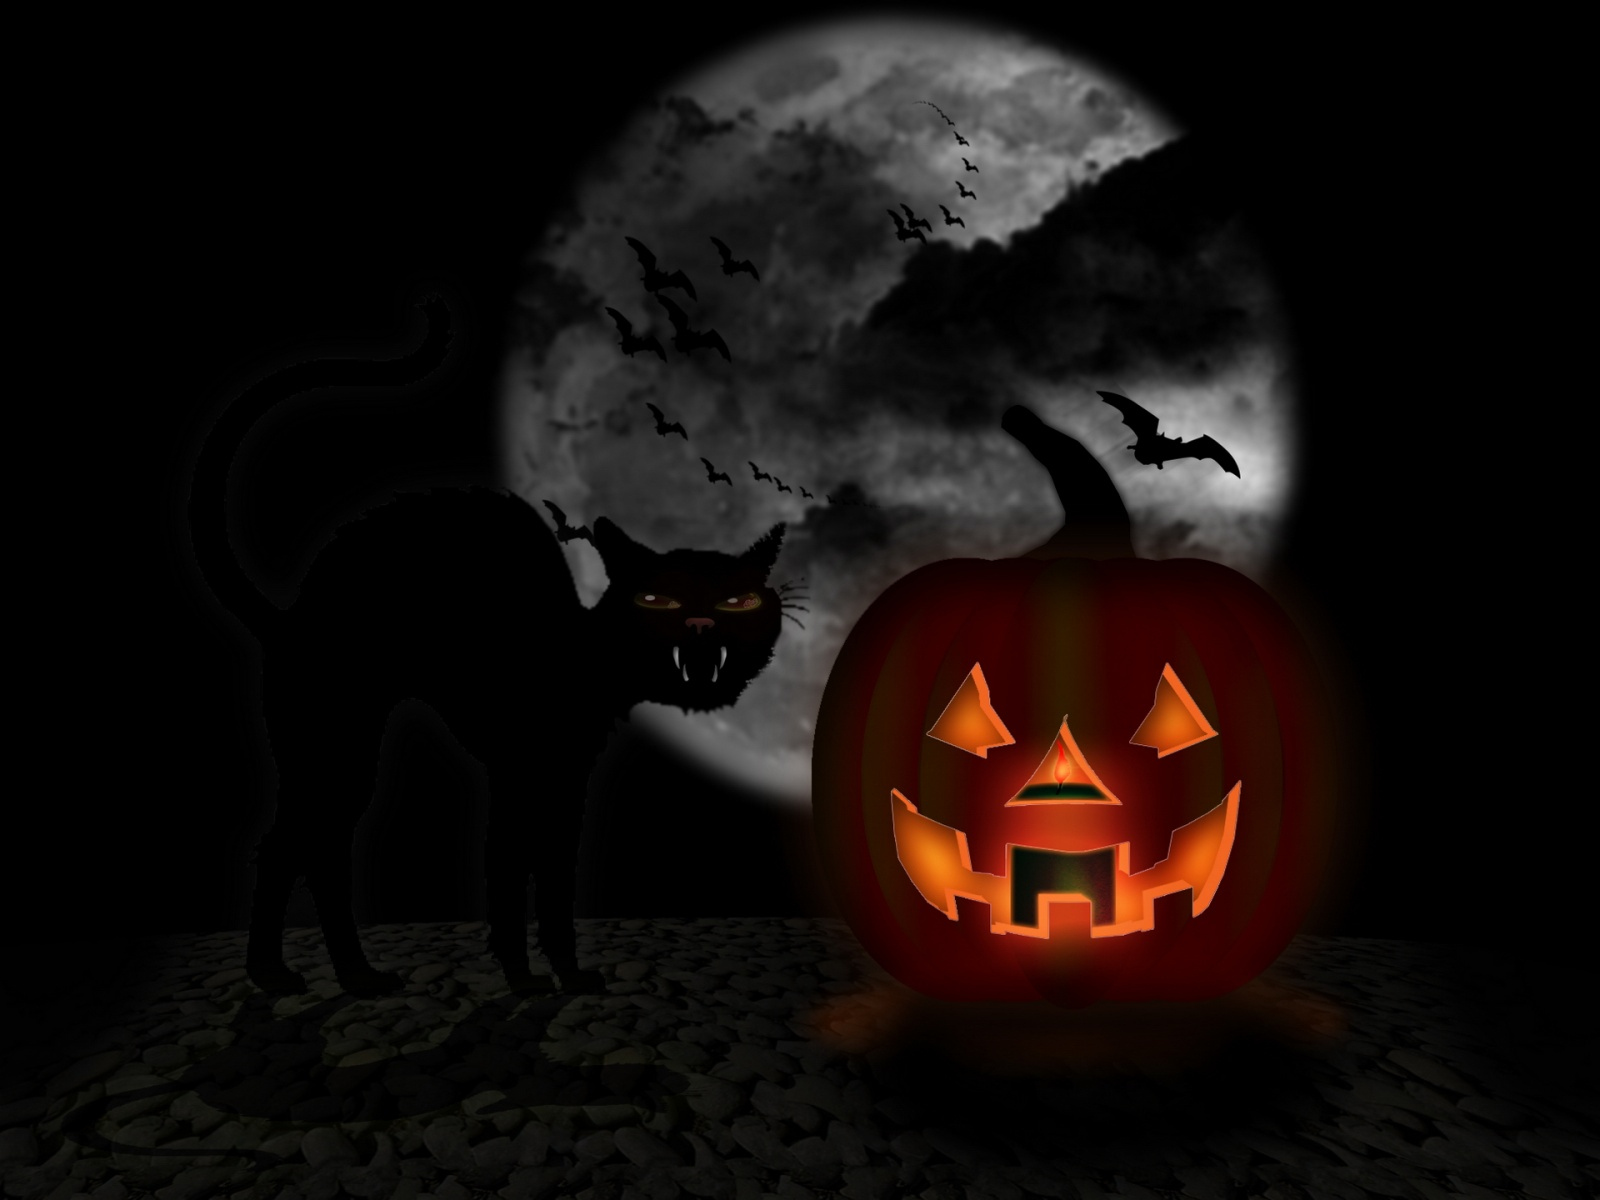 Cute Photography Love Halloween Wallpaper 1600x1200